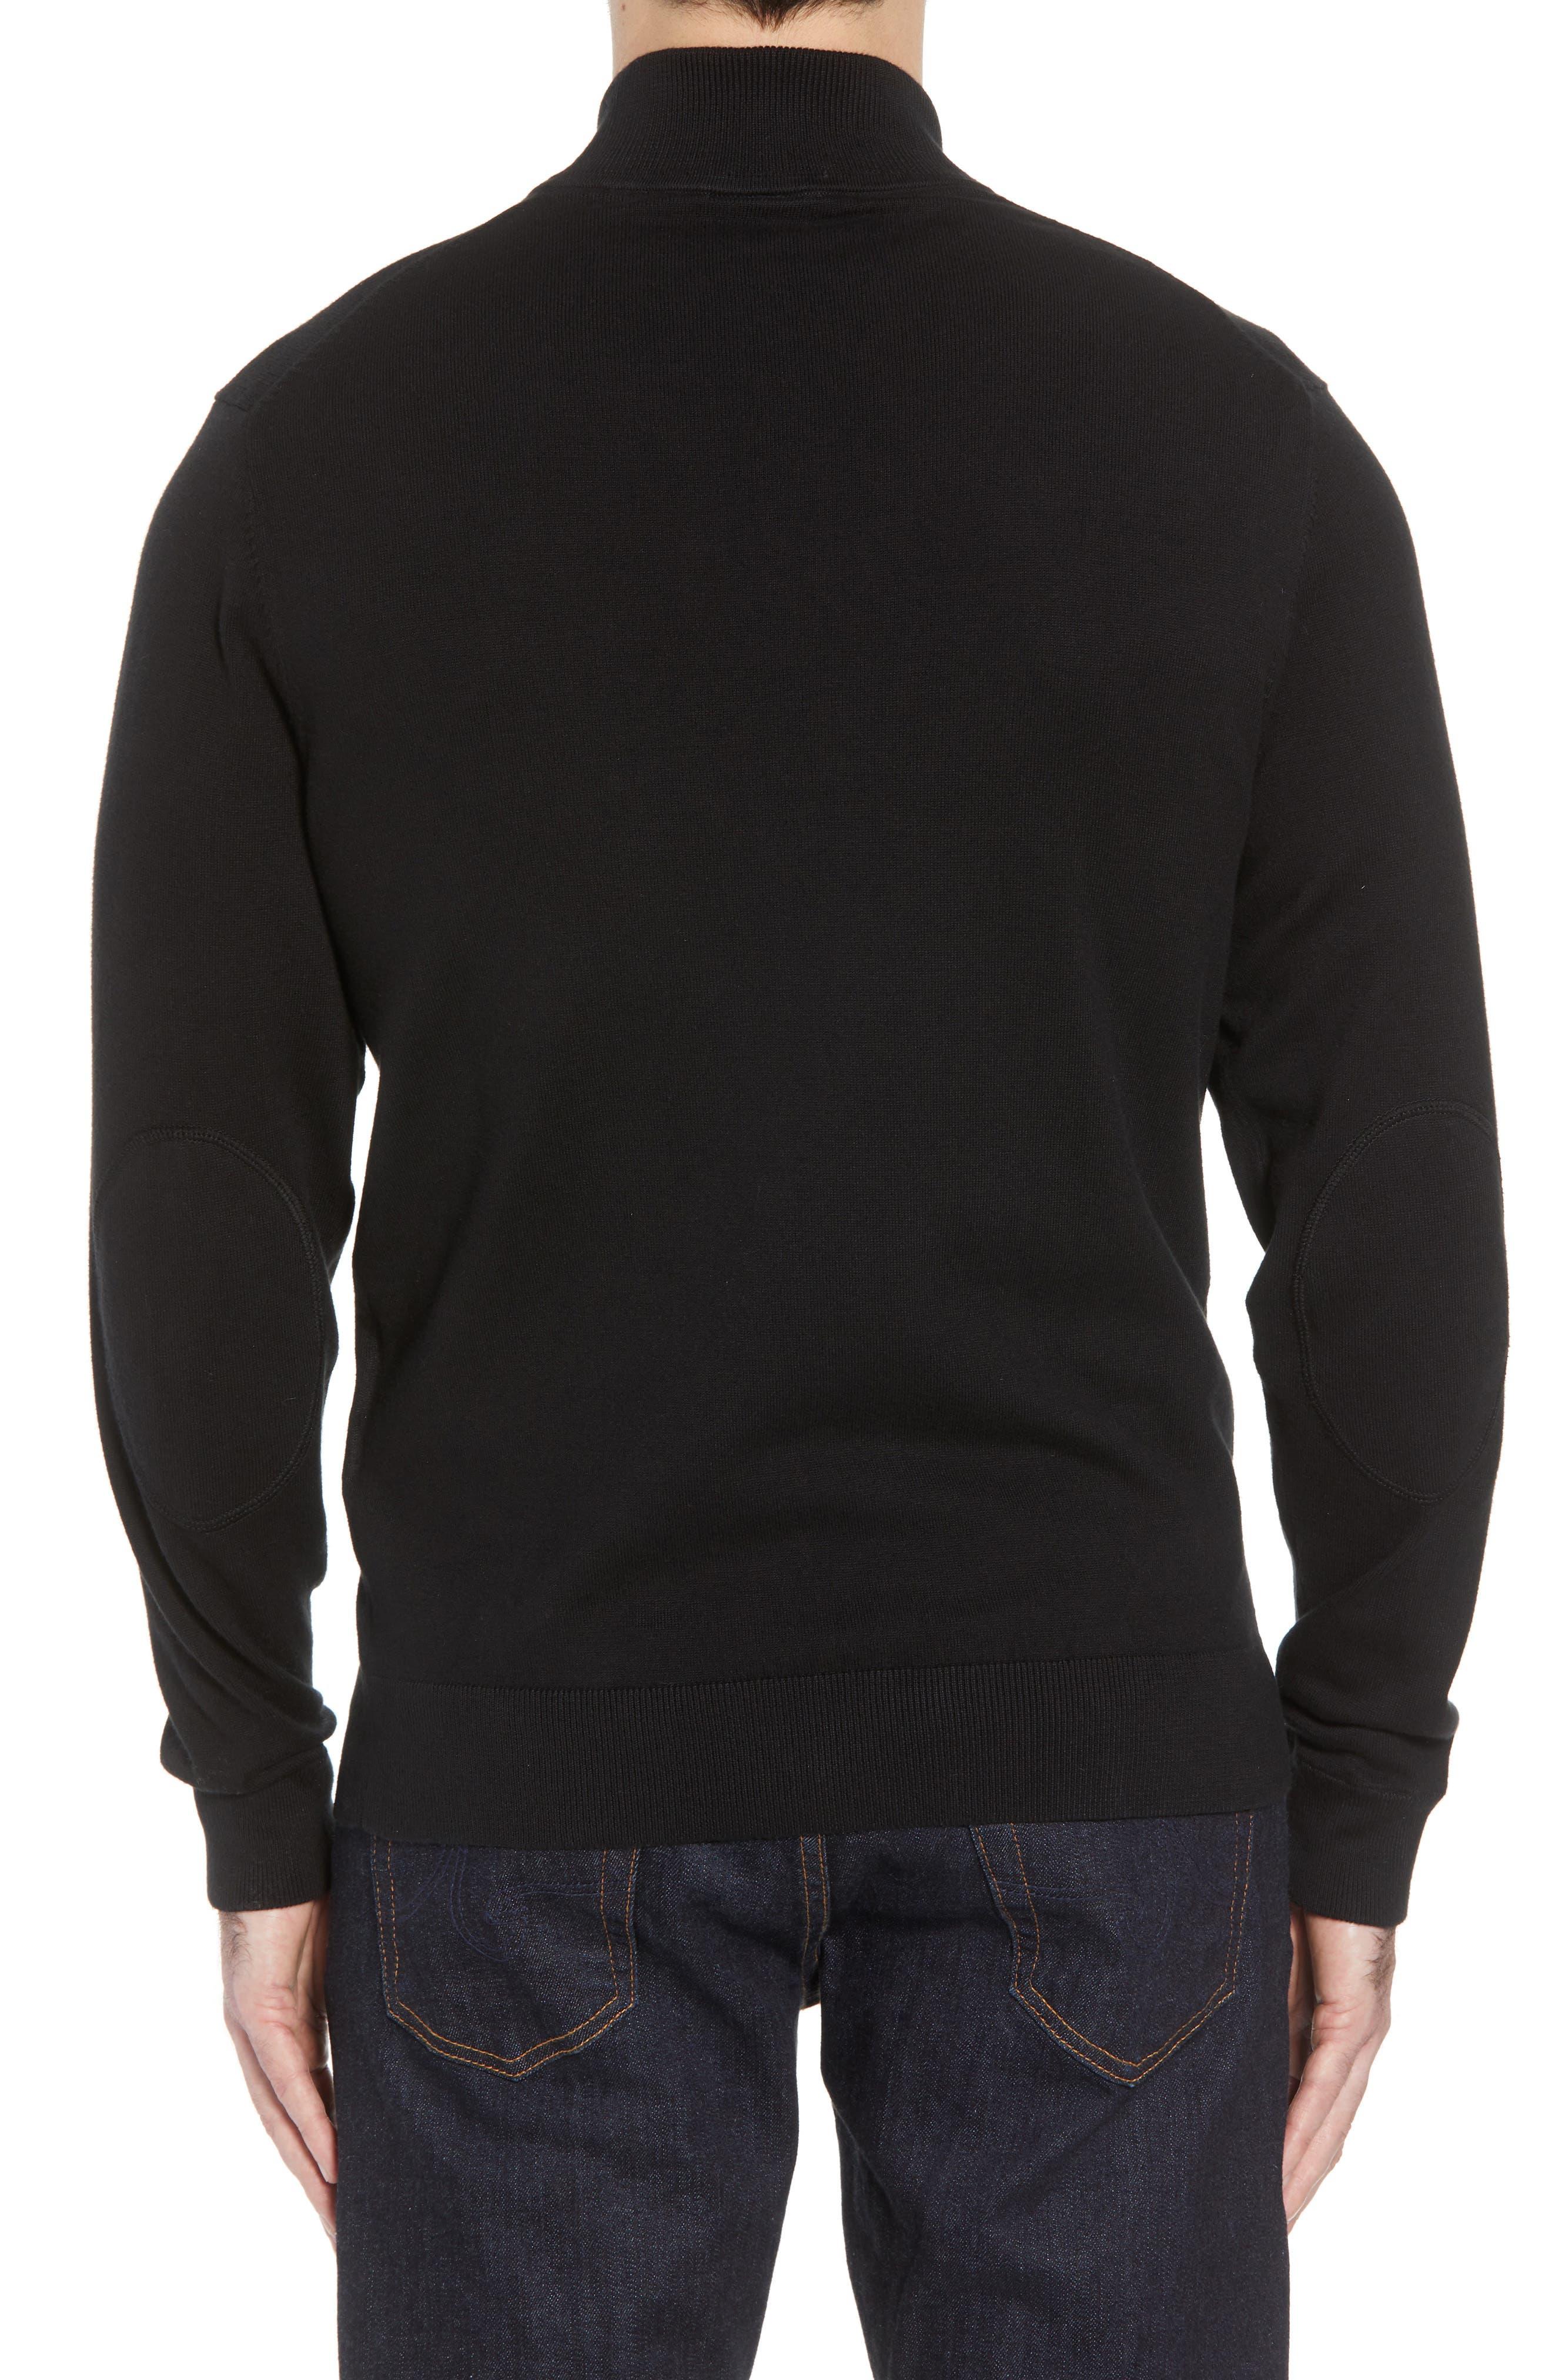 Pittsburgh Steelers - Lakemont Regular Fit Half Zip Sweater,                             Alternate thumbnail 2, color,                             001